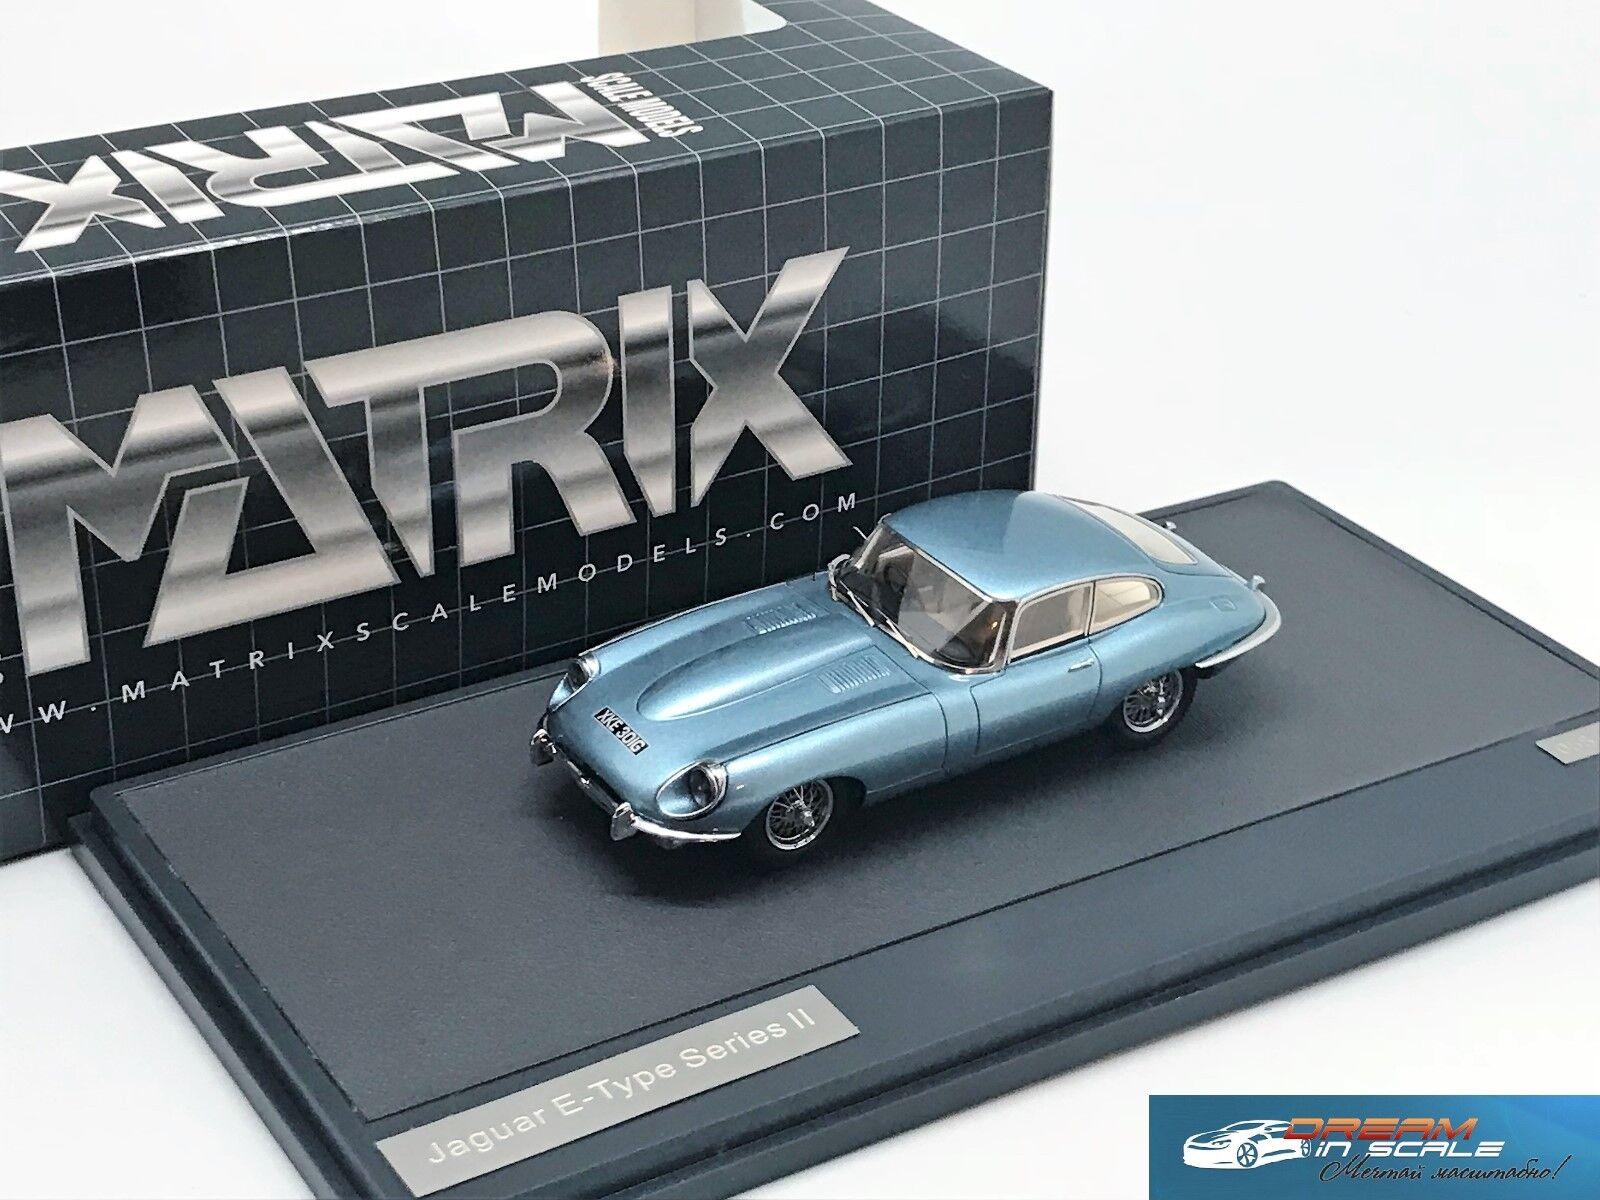 Jaguar e-type sii coupé 1970 blau metallic - matrix mx11001-051 1 43